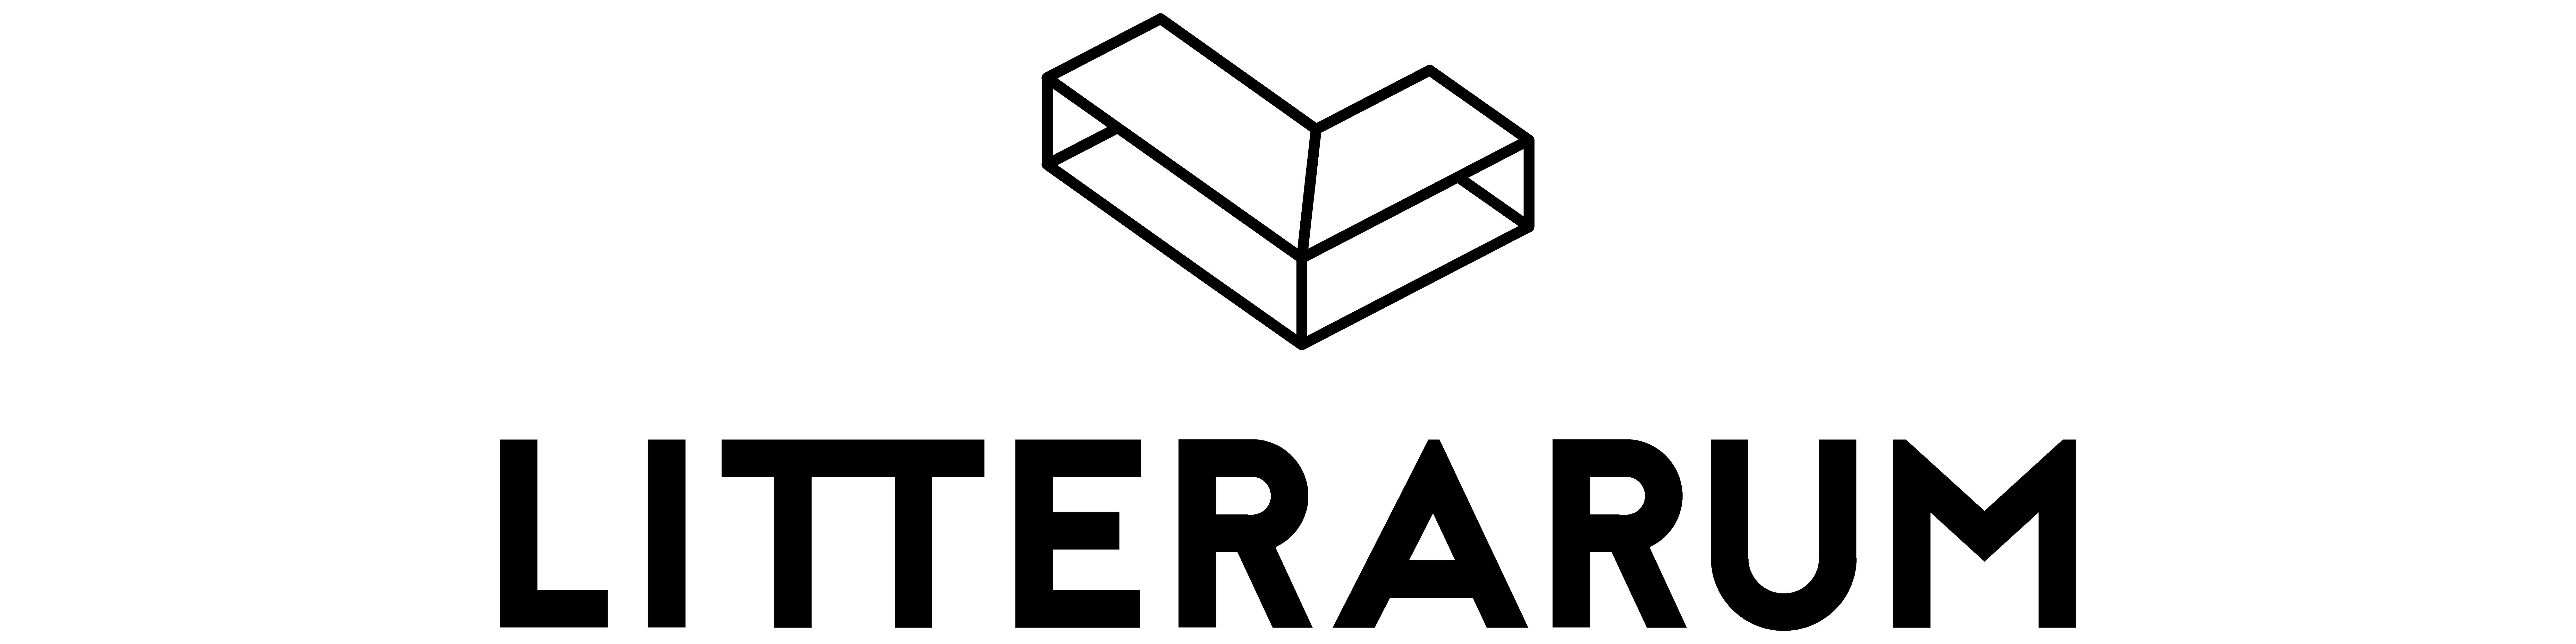 Logo Litteraruma Martina Ganzer